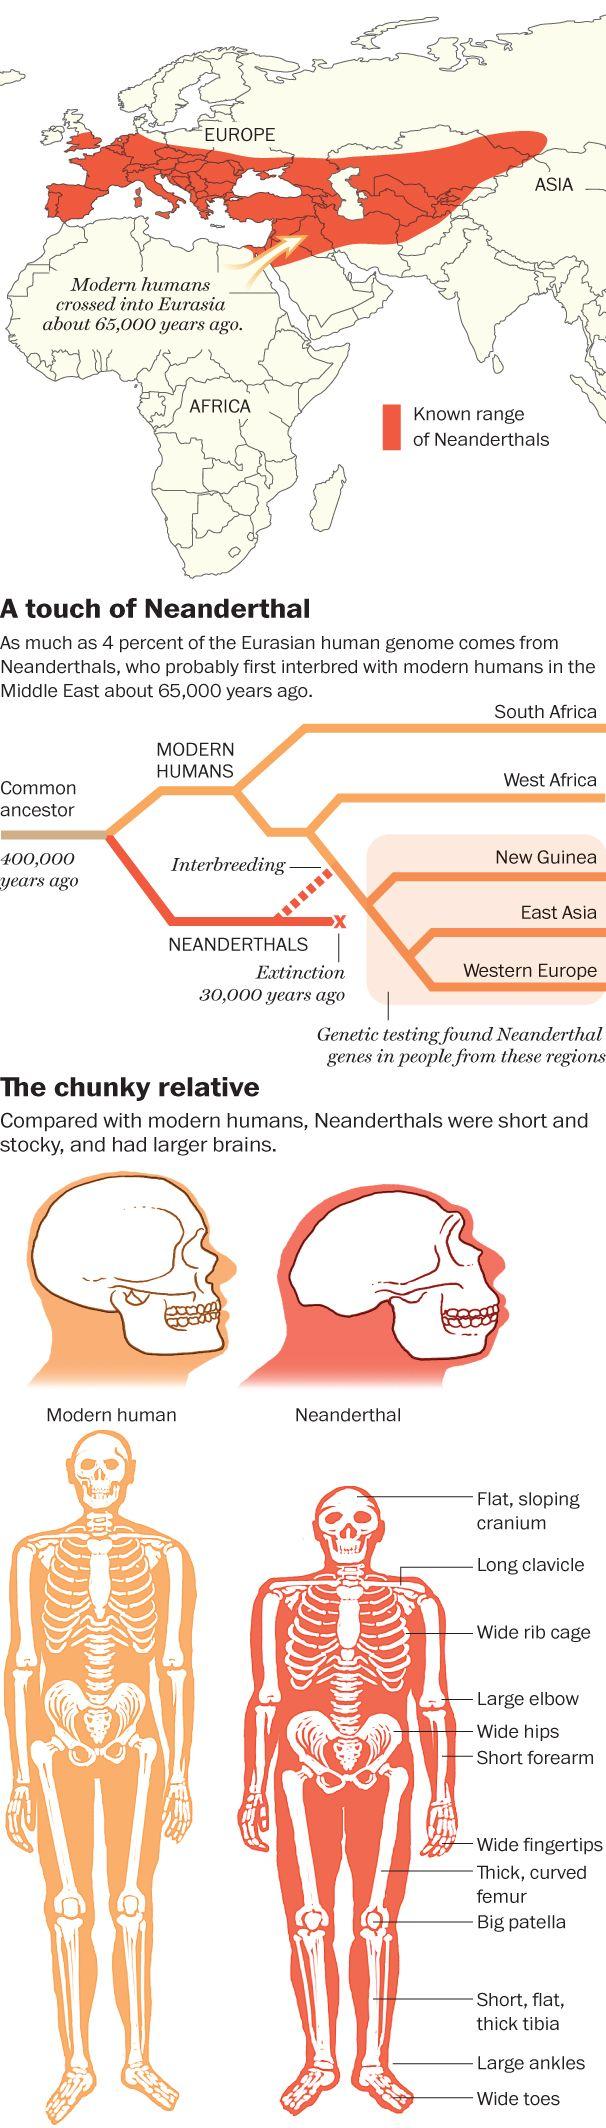 Mark of the Neanderthal - The Washington Post